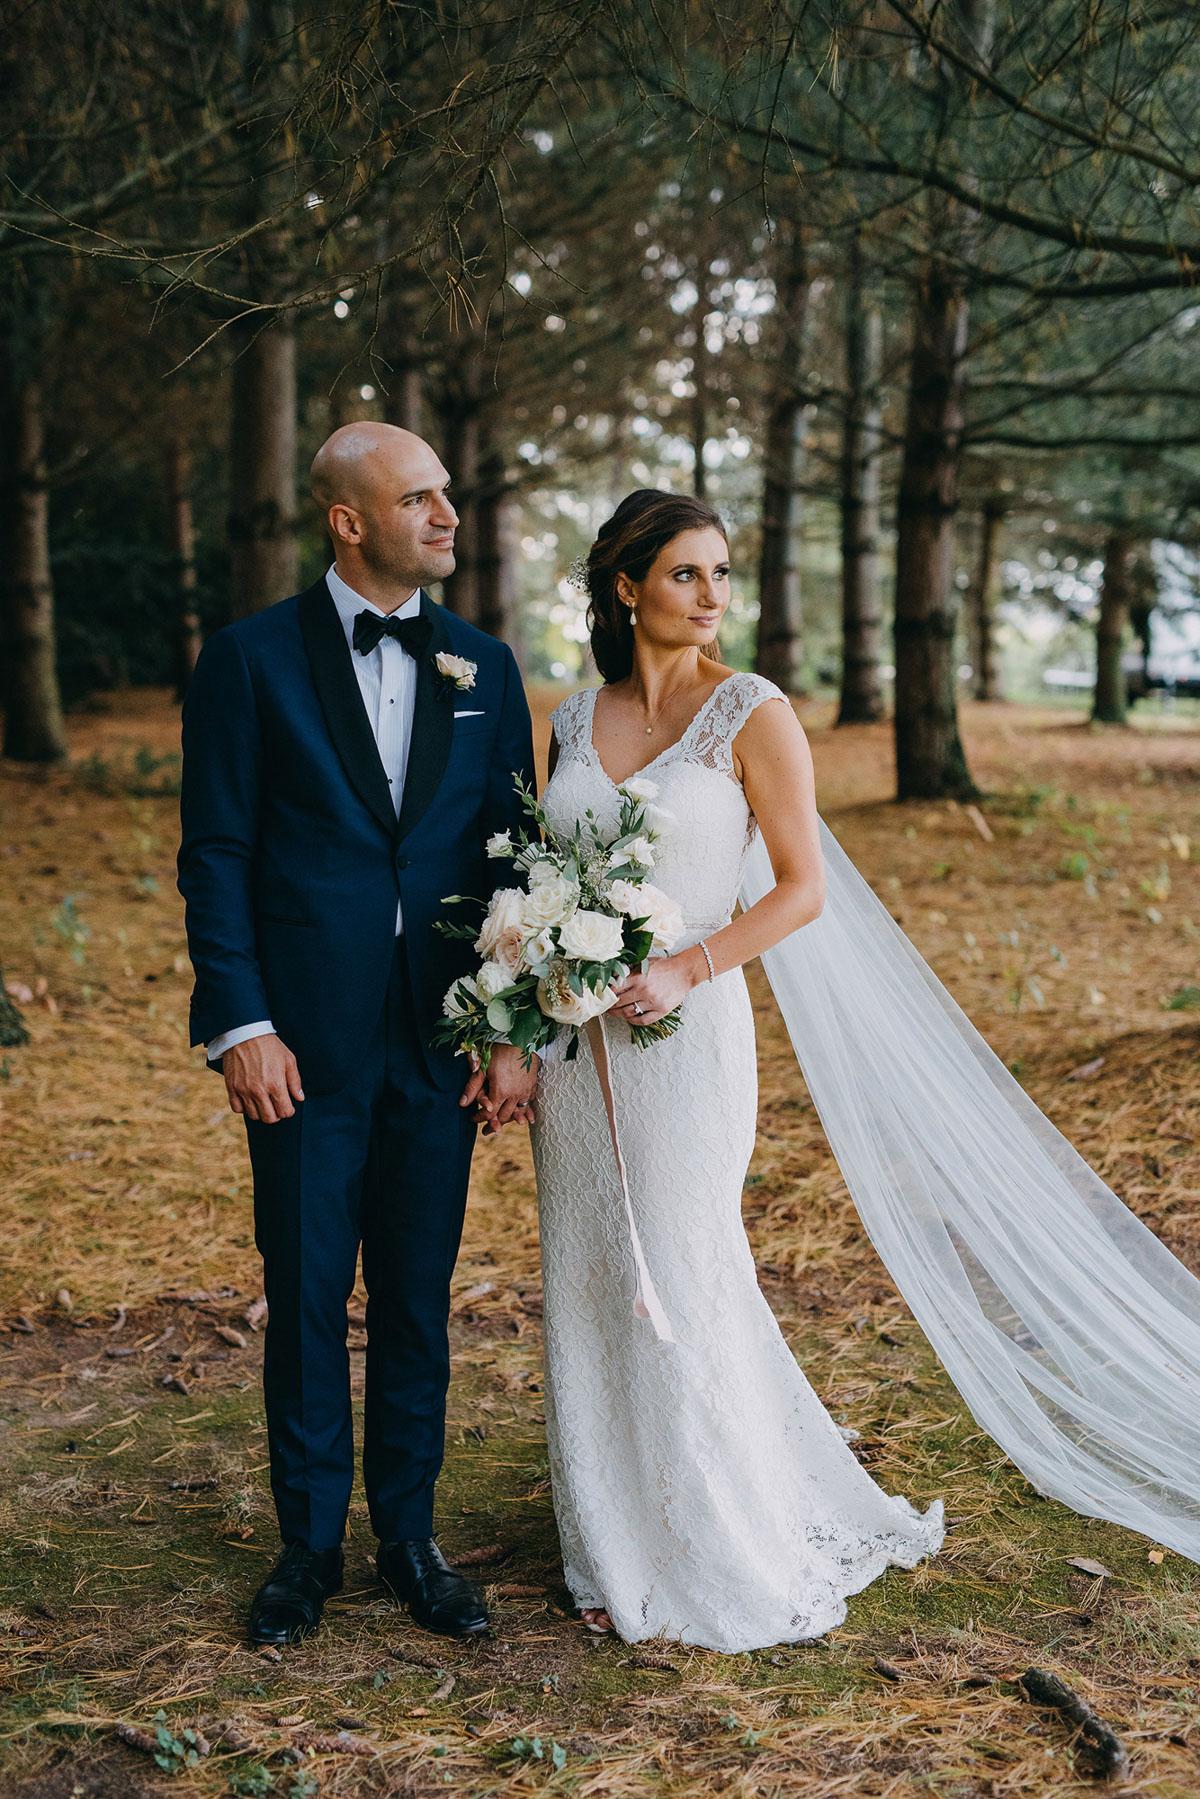 shaw-events-vineyard-bride-swish-list-kurtz-orchards-niagara-on-the-lake-wedding-31.jpg